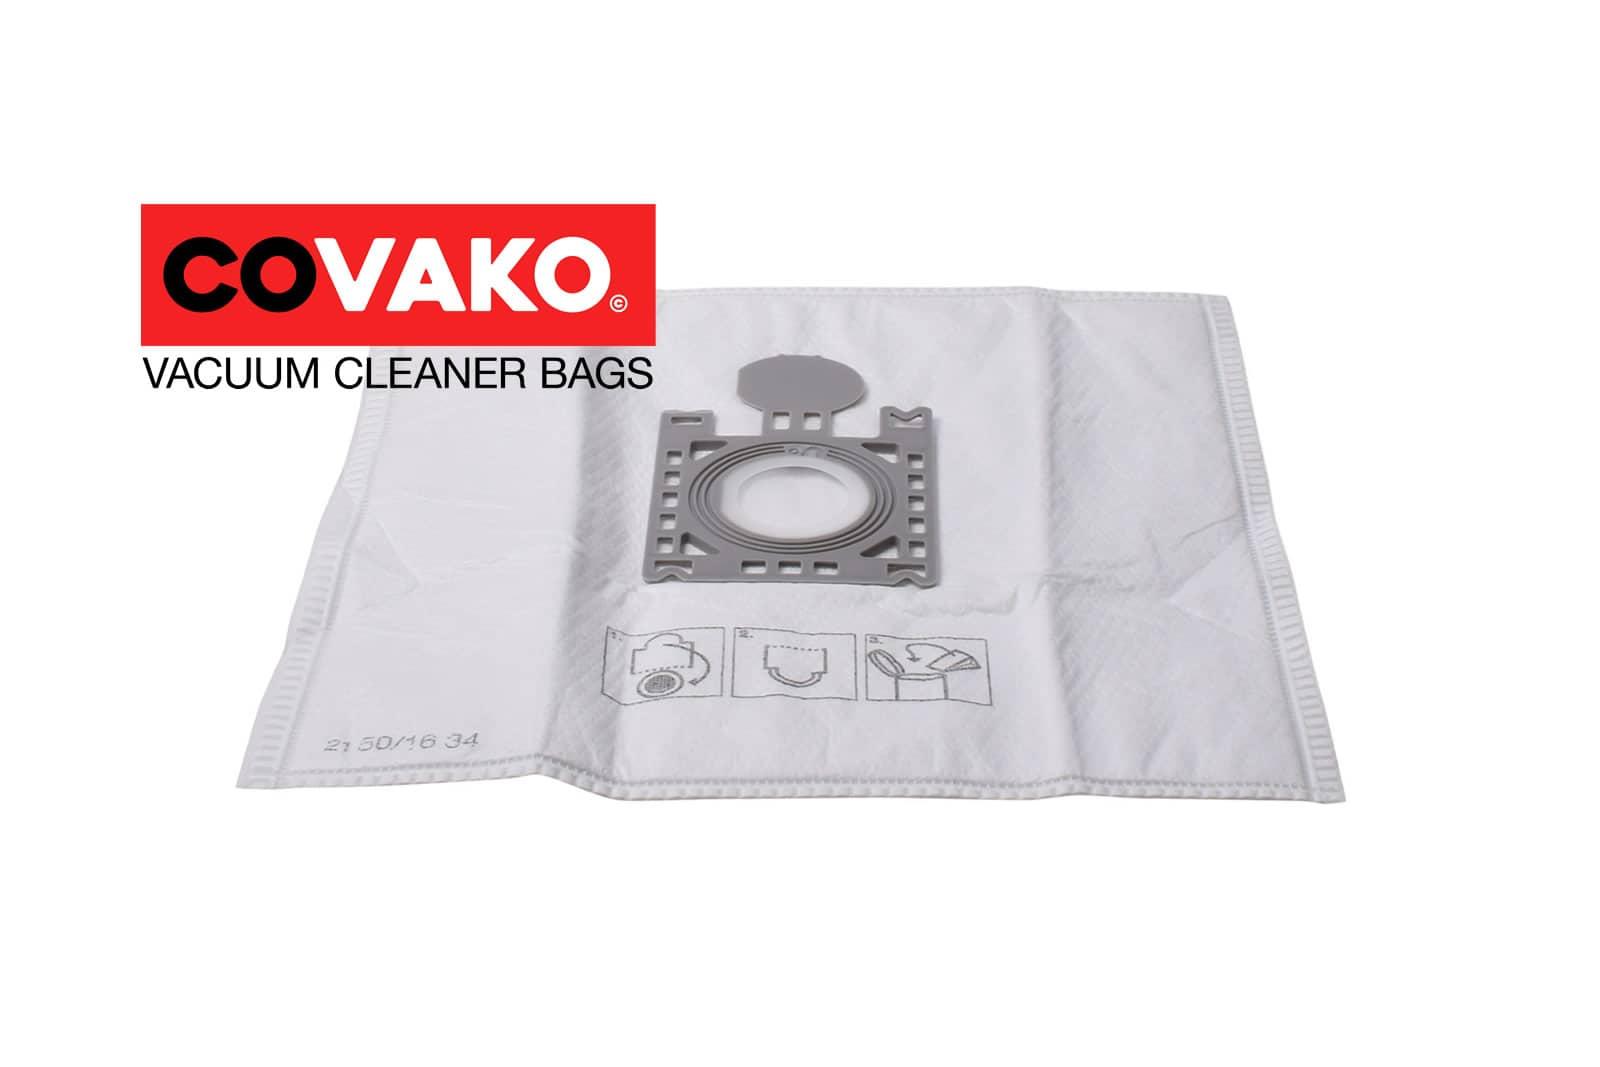 EIO Compact Eco / Synthétique - EIO sacs d'aspirateur